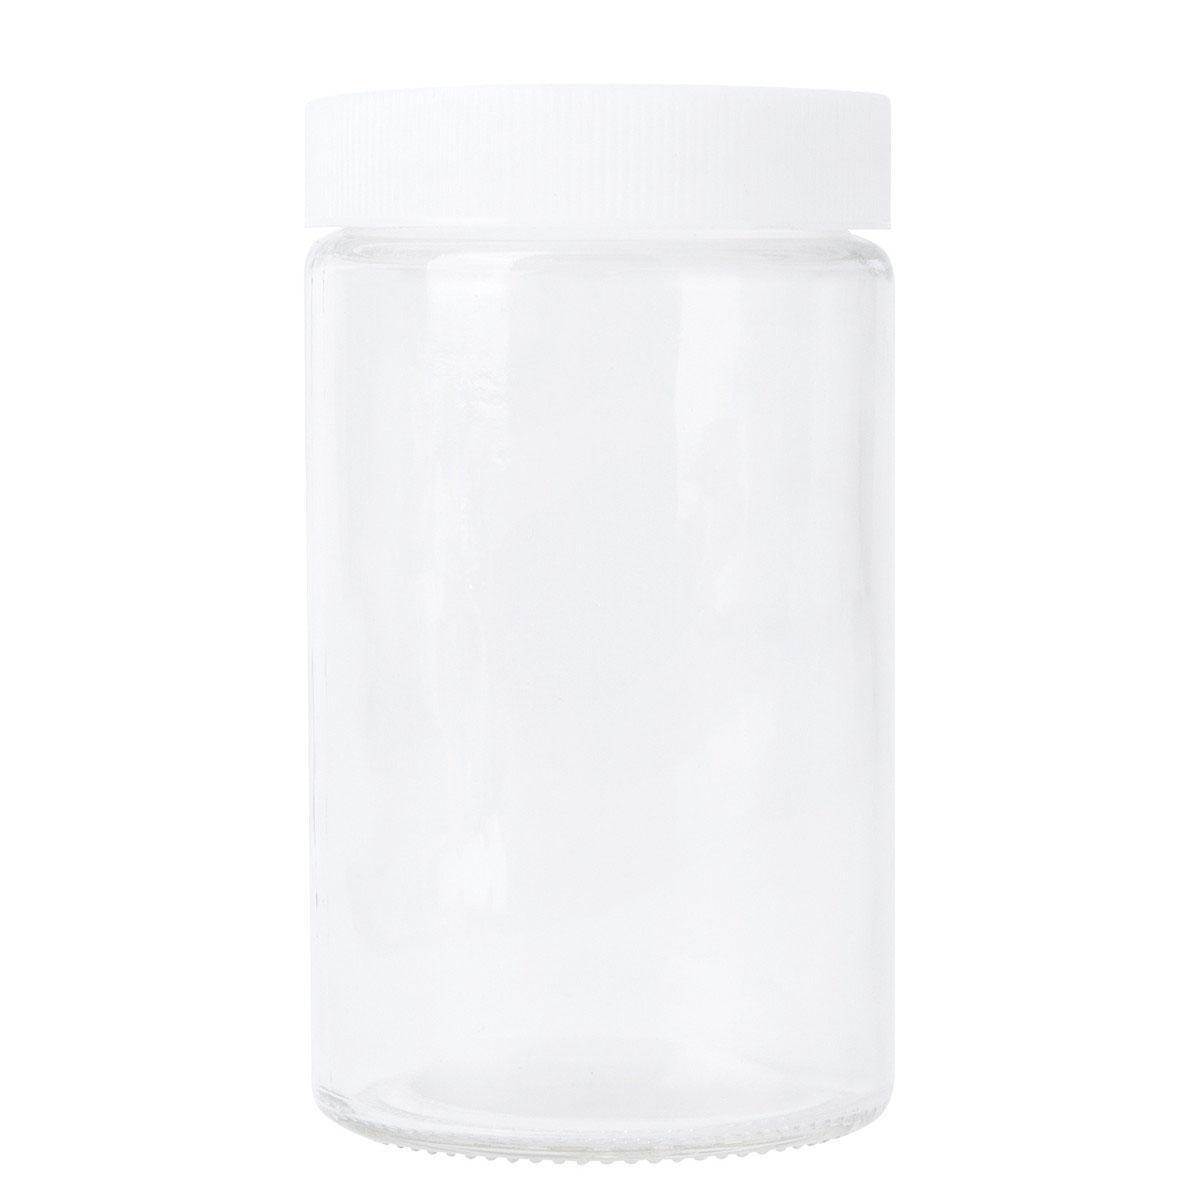 White Lid For 10oz Standard Glass Jar (72 Qty.)